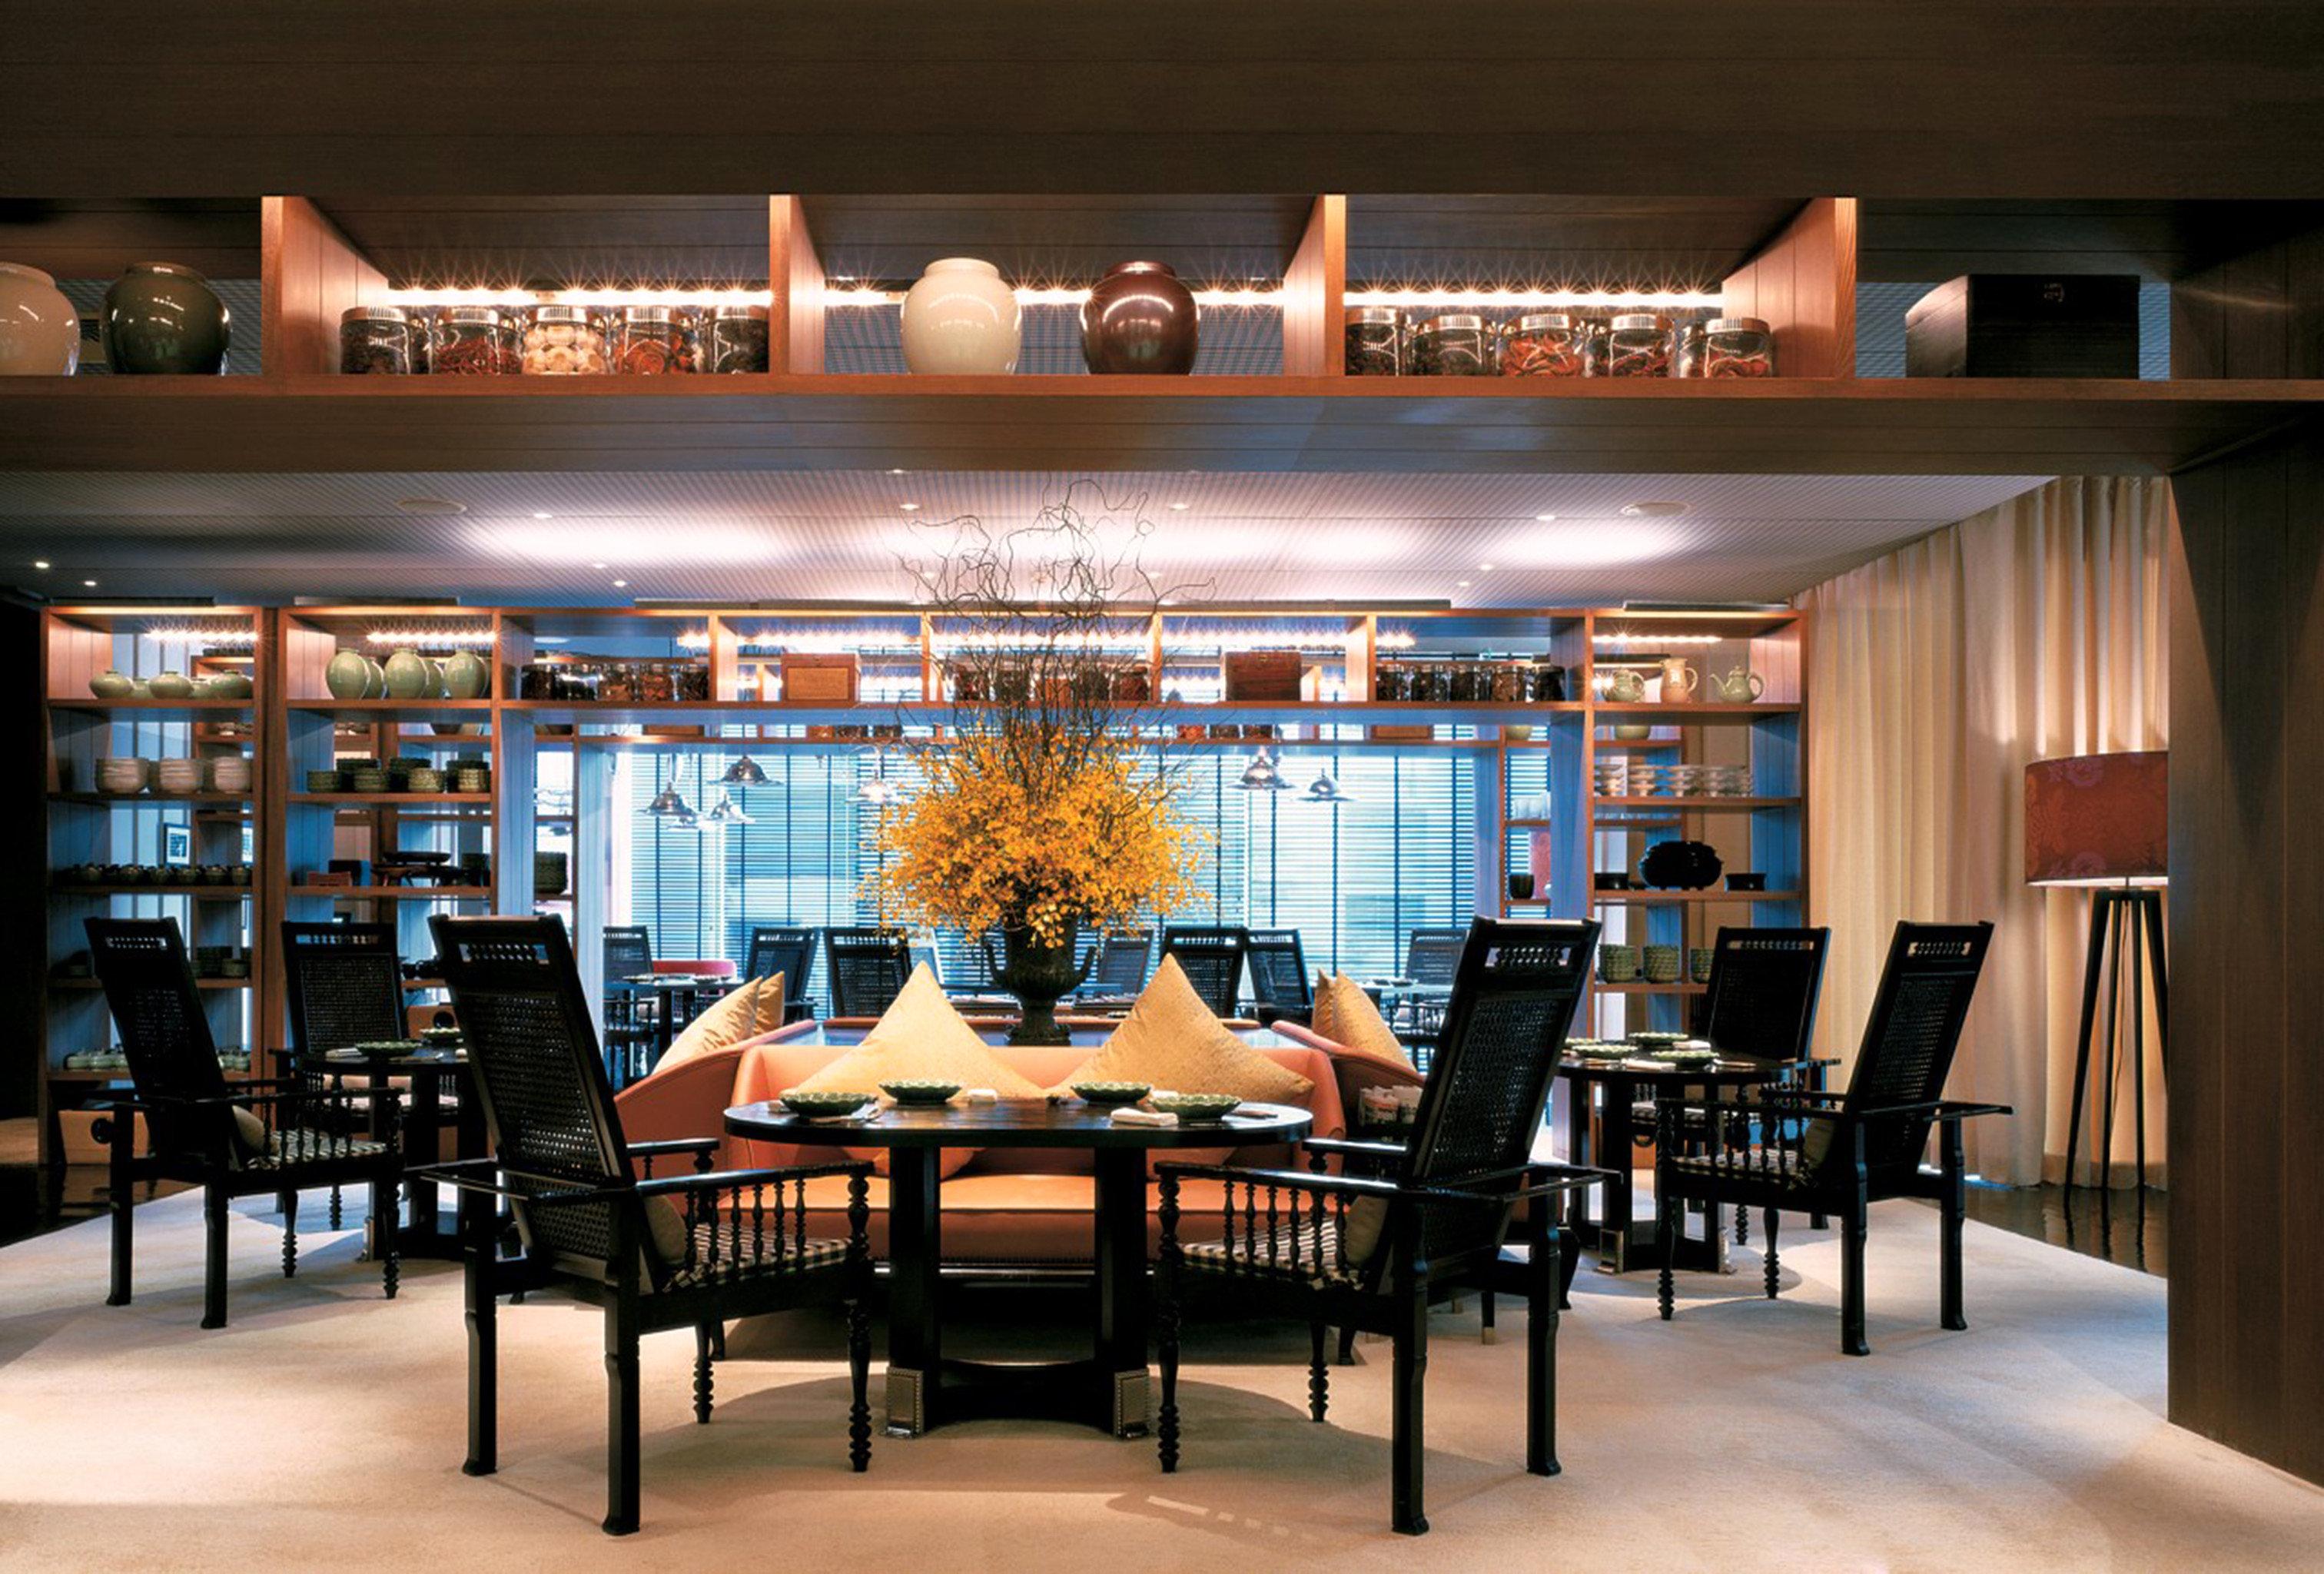 City Dining Drink Eat Lounge chair restaurant function hall Bar café